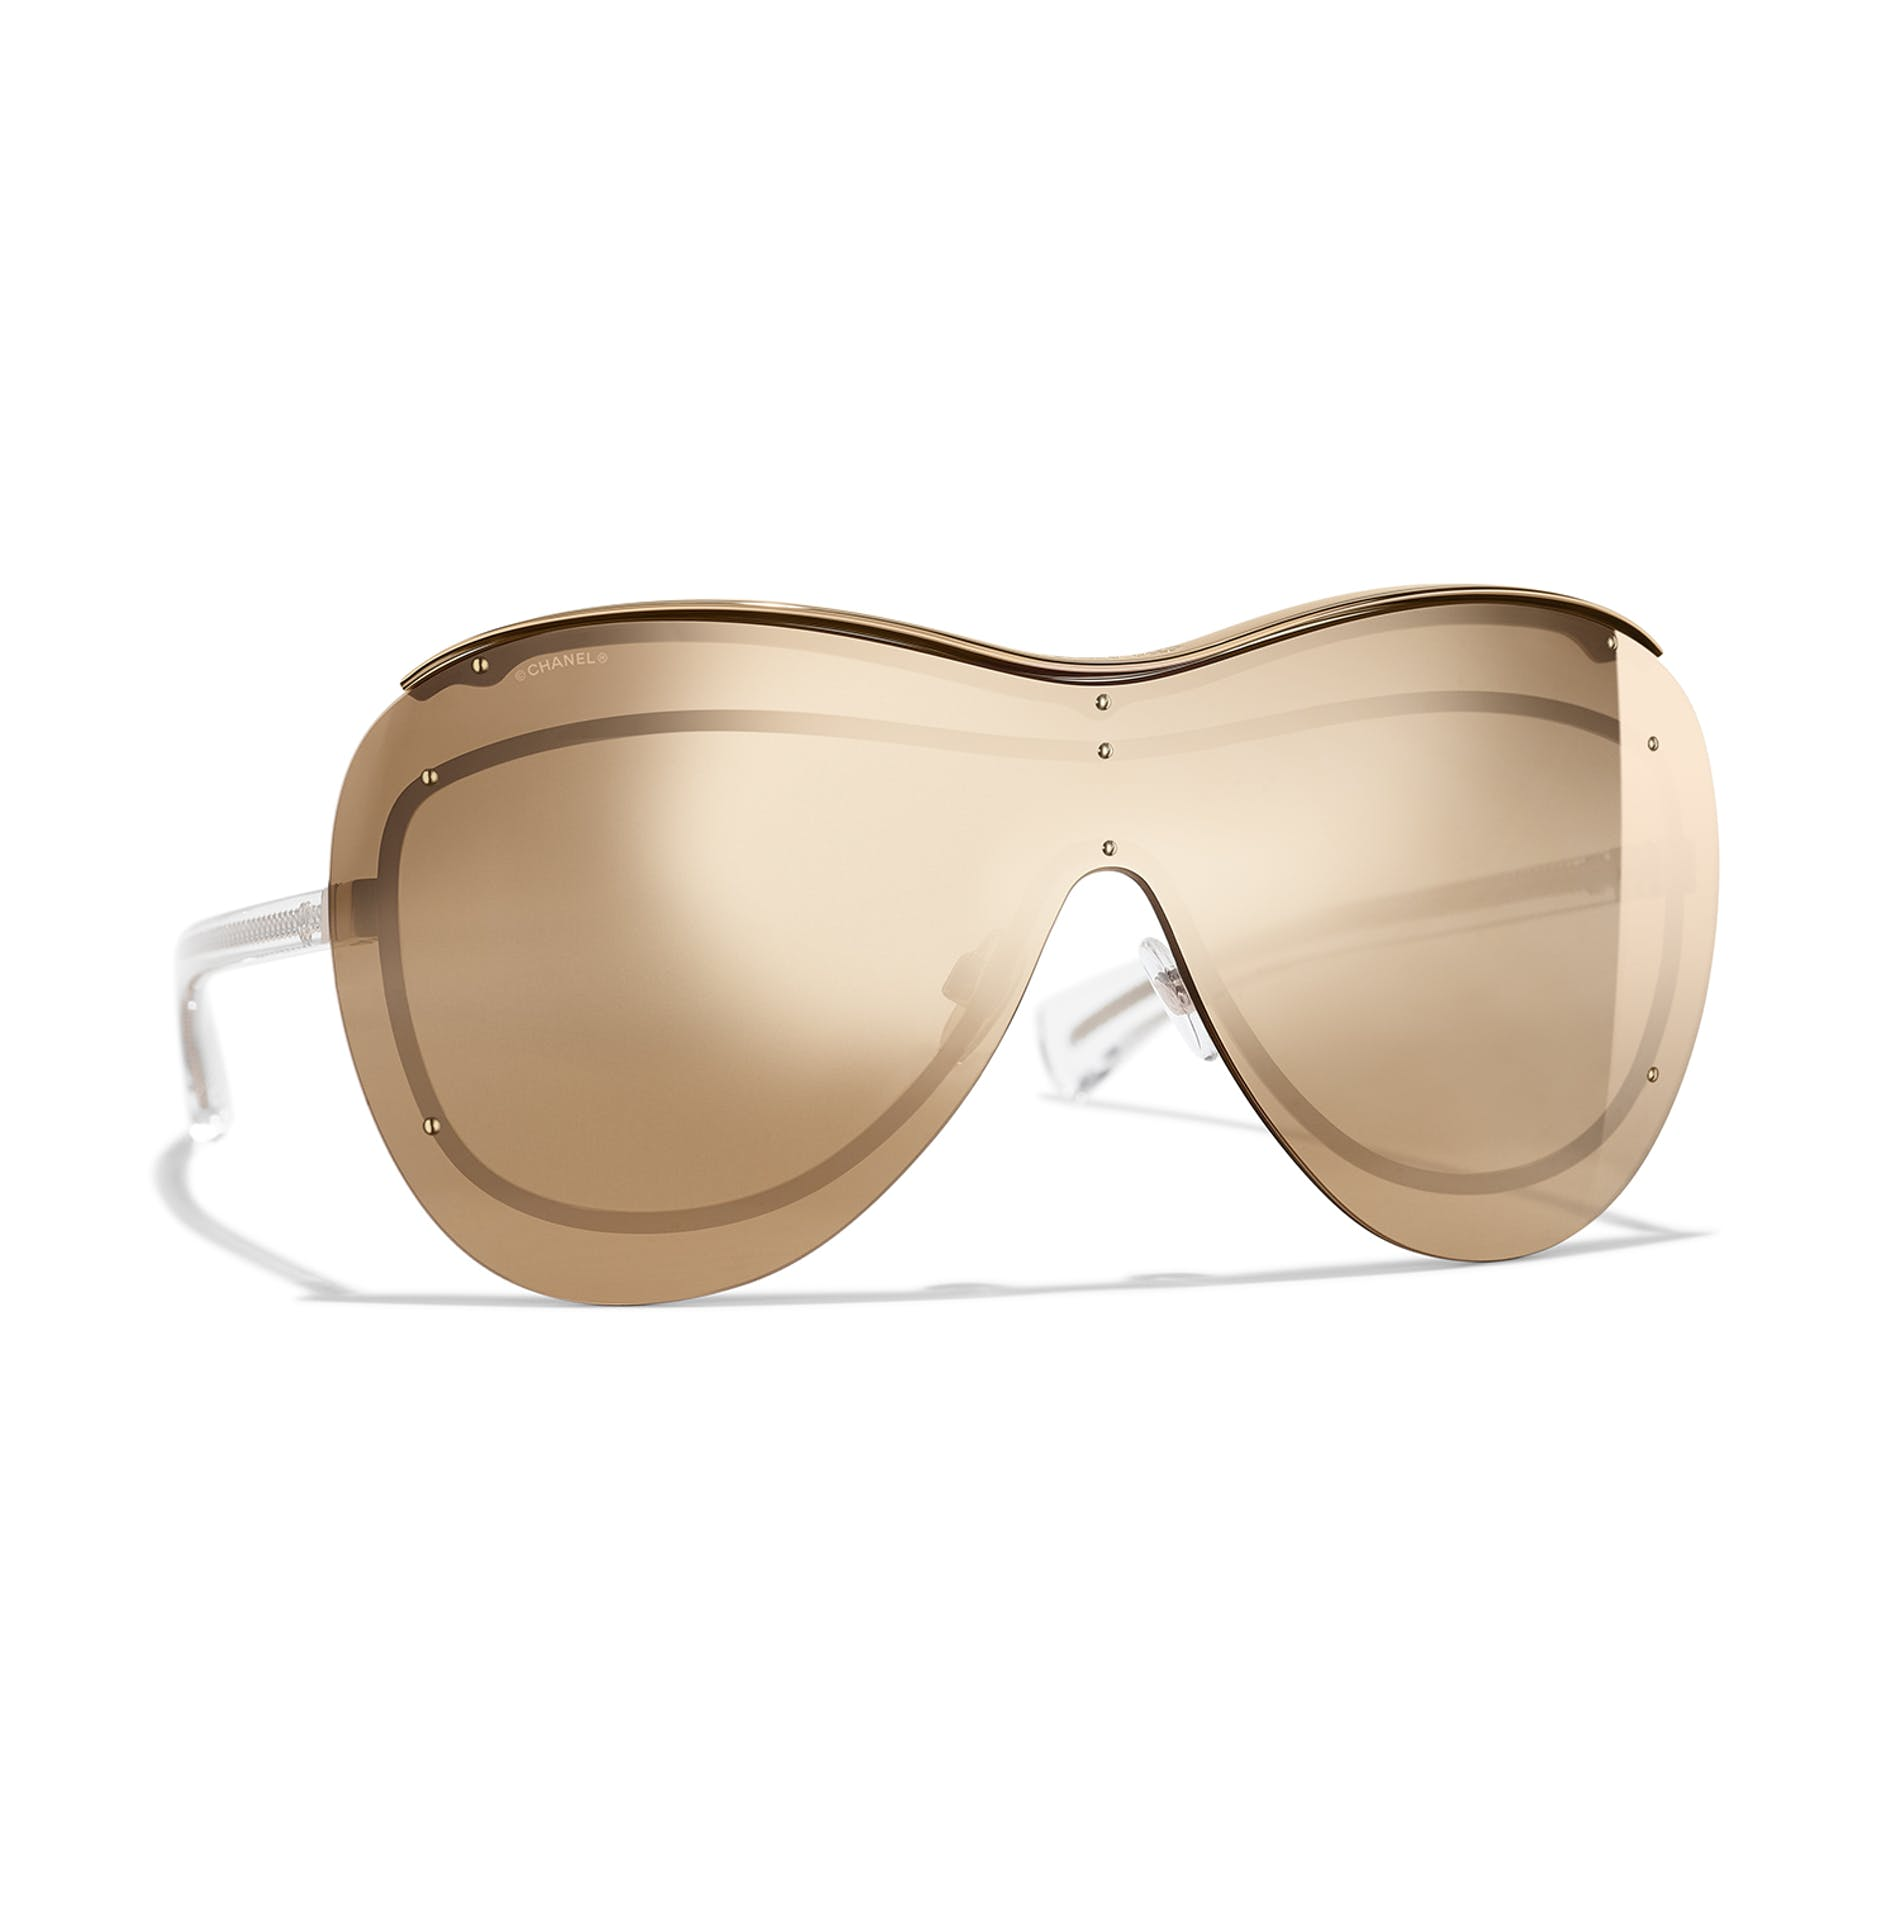 a3eaae70659 MANIFESTO - RETRO SHIELDS  Chanel s Summer Shield Sunglasses